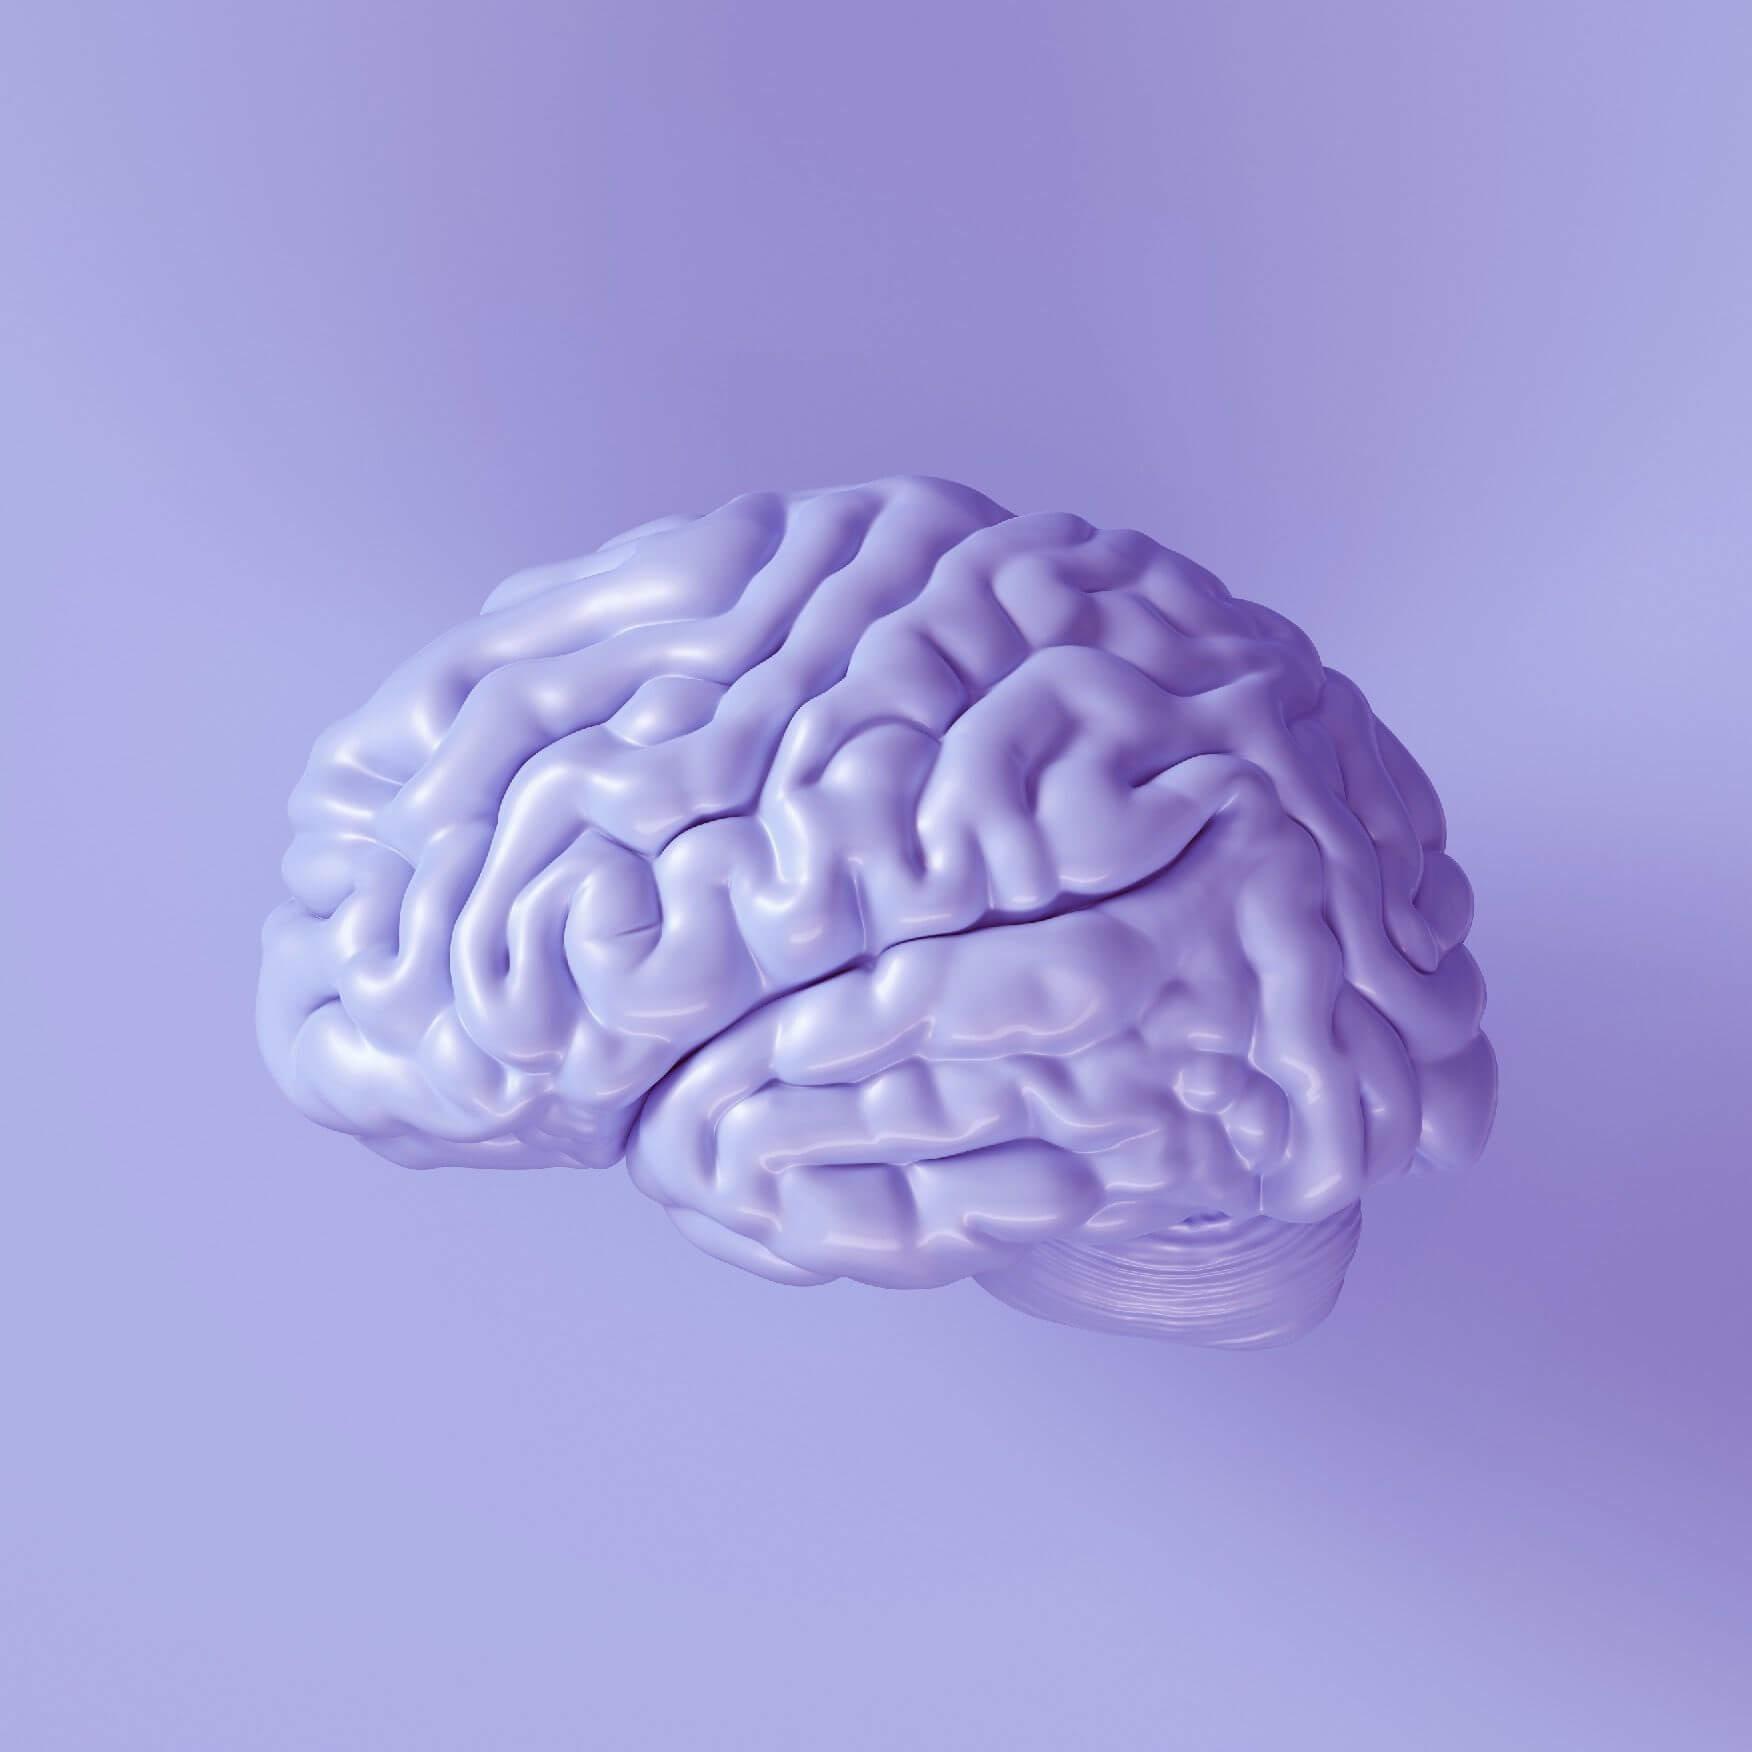 Nootropics For Brain Health